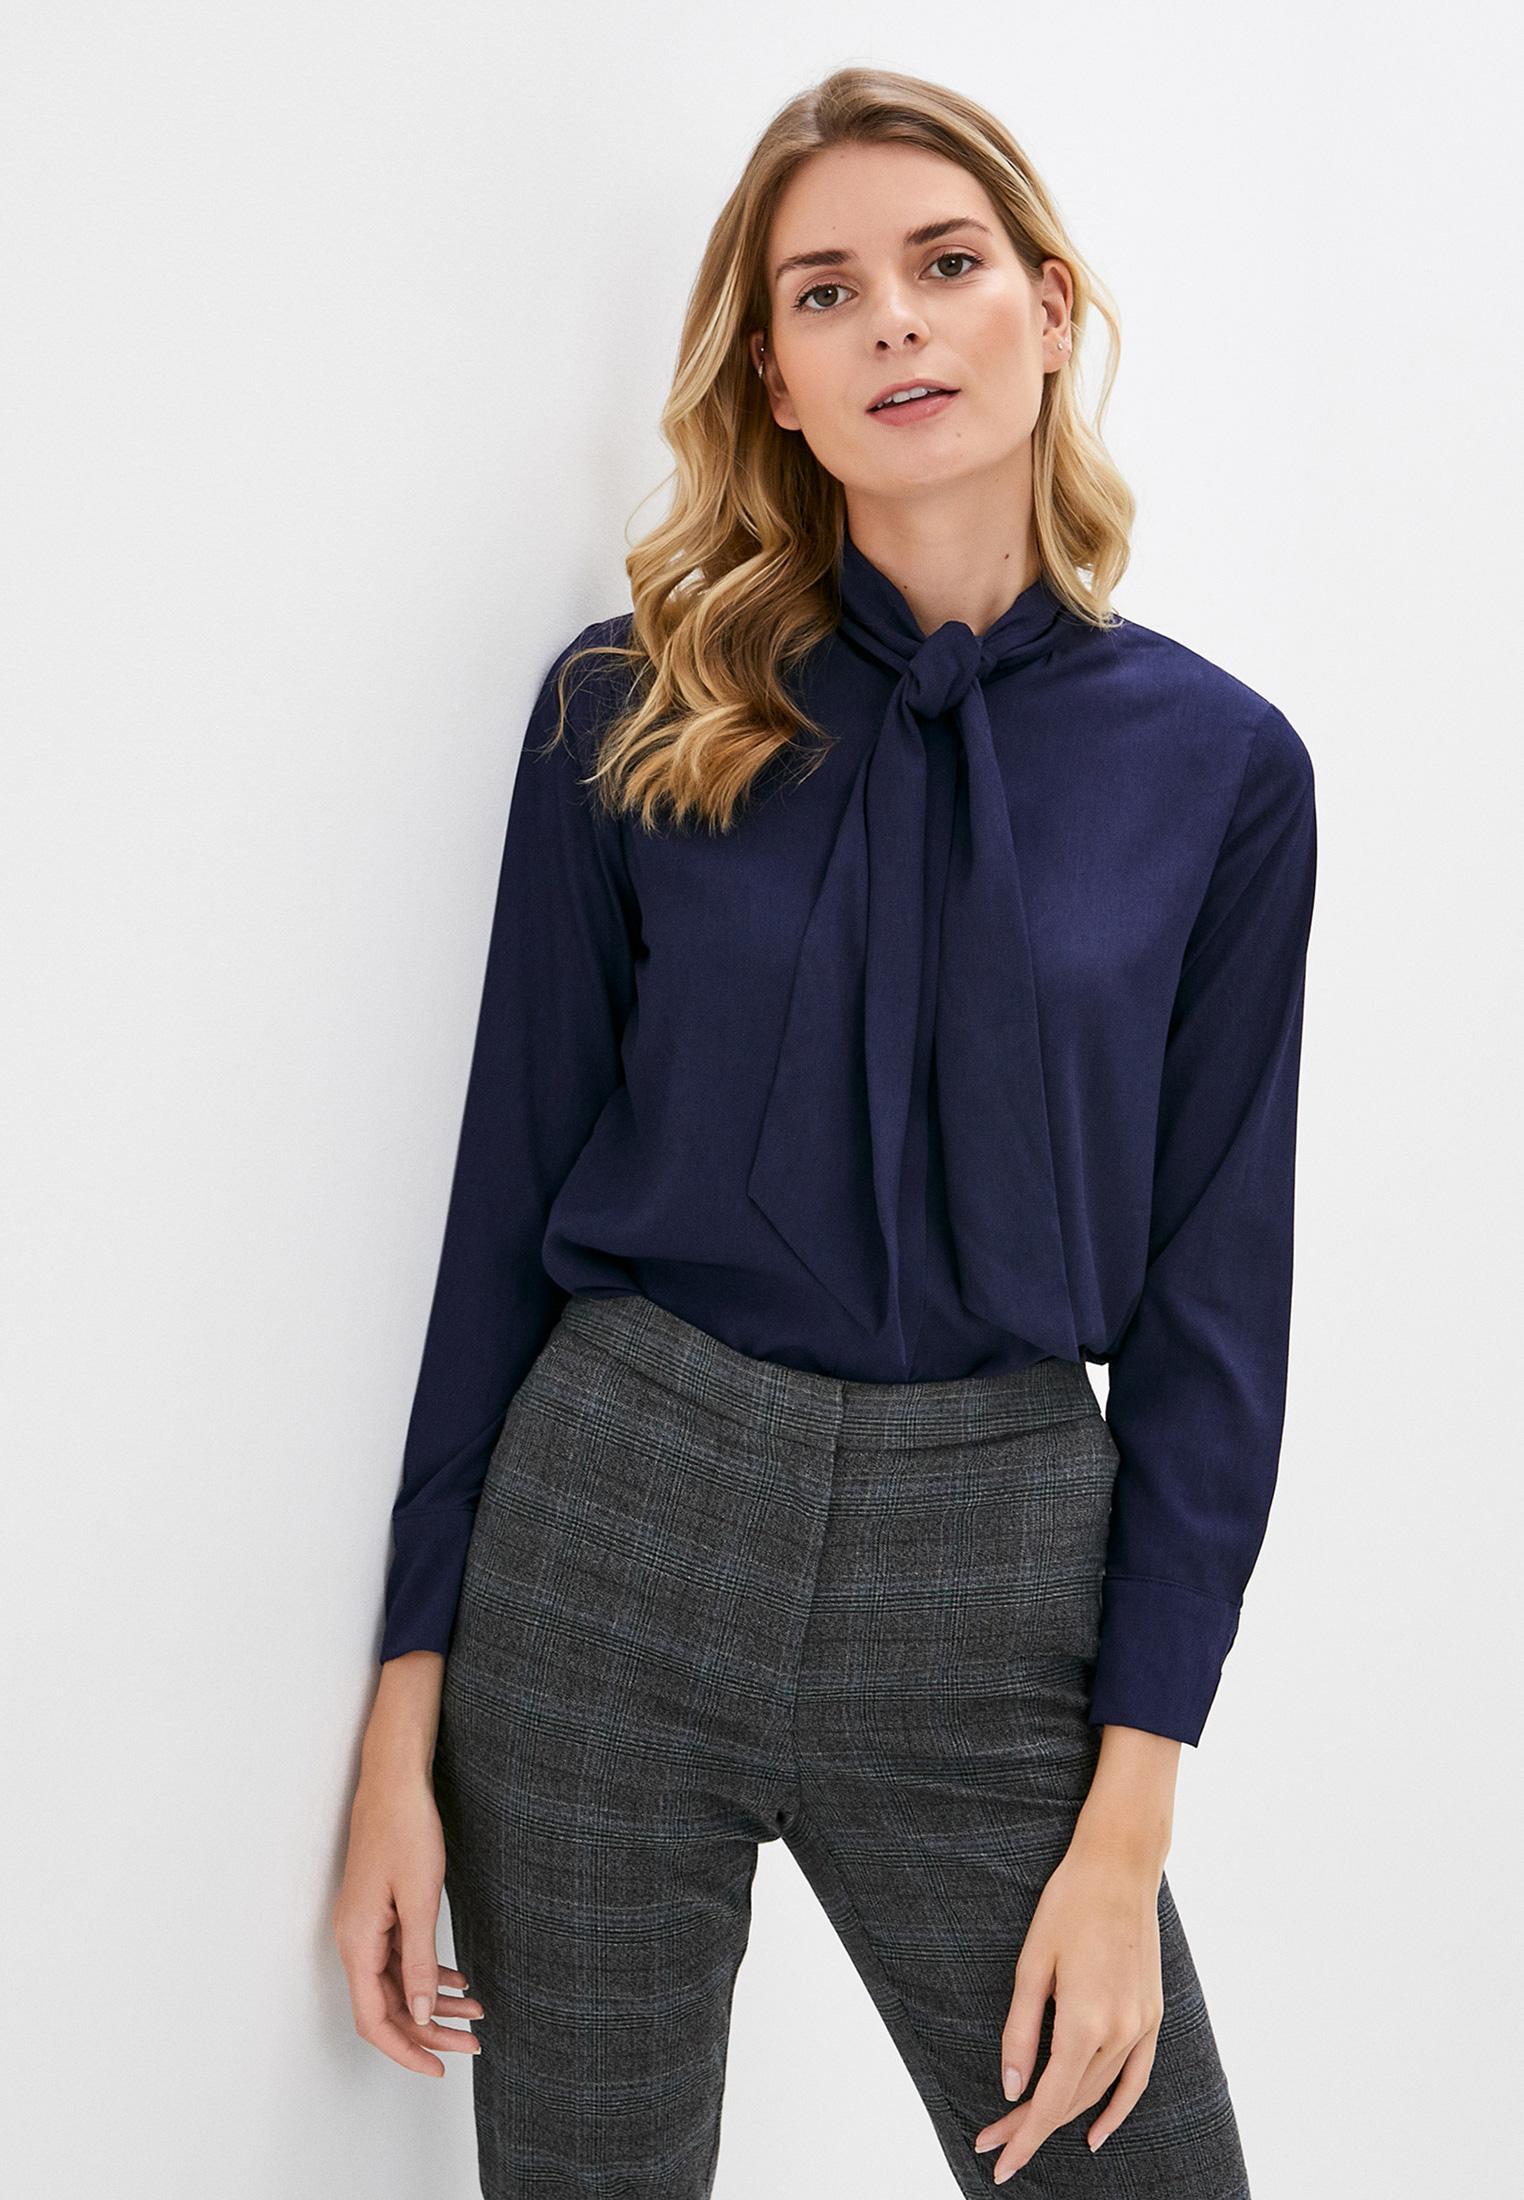 Блуза Zarina купить за 671 ₽ в интернет-магазине Lamoda.ru